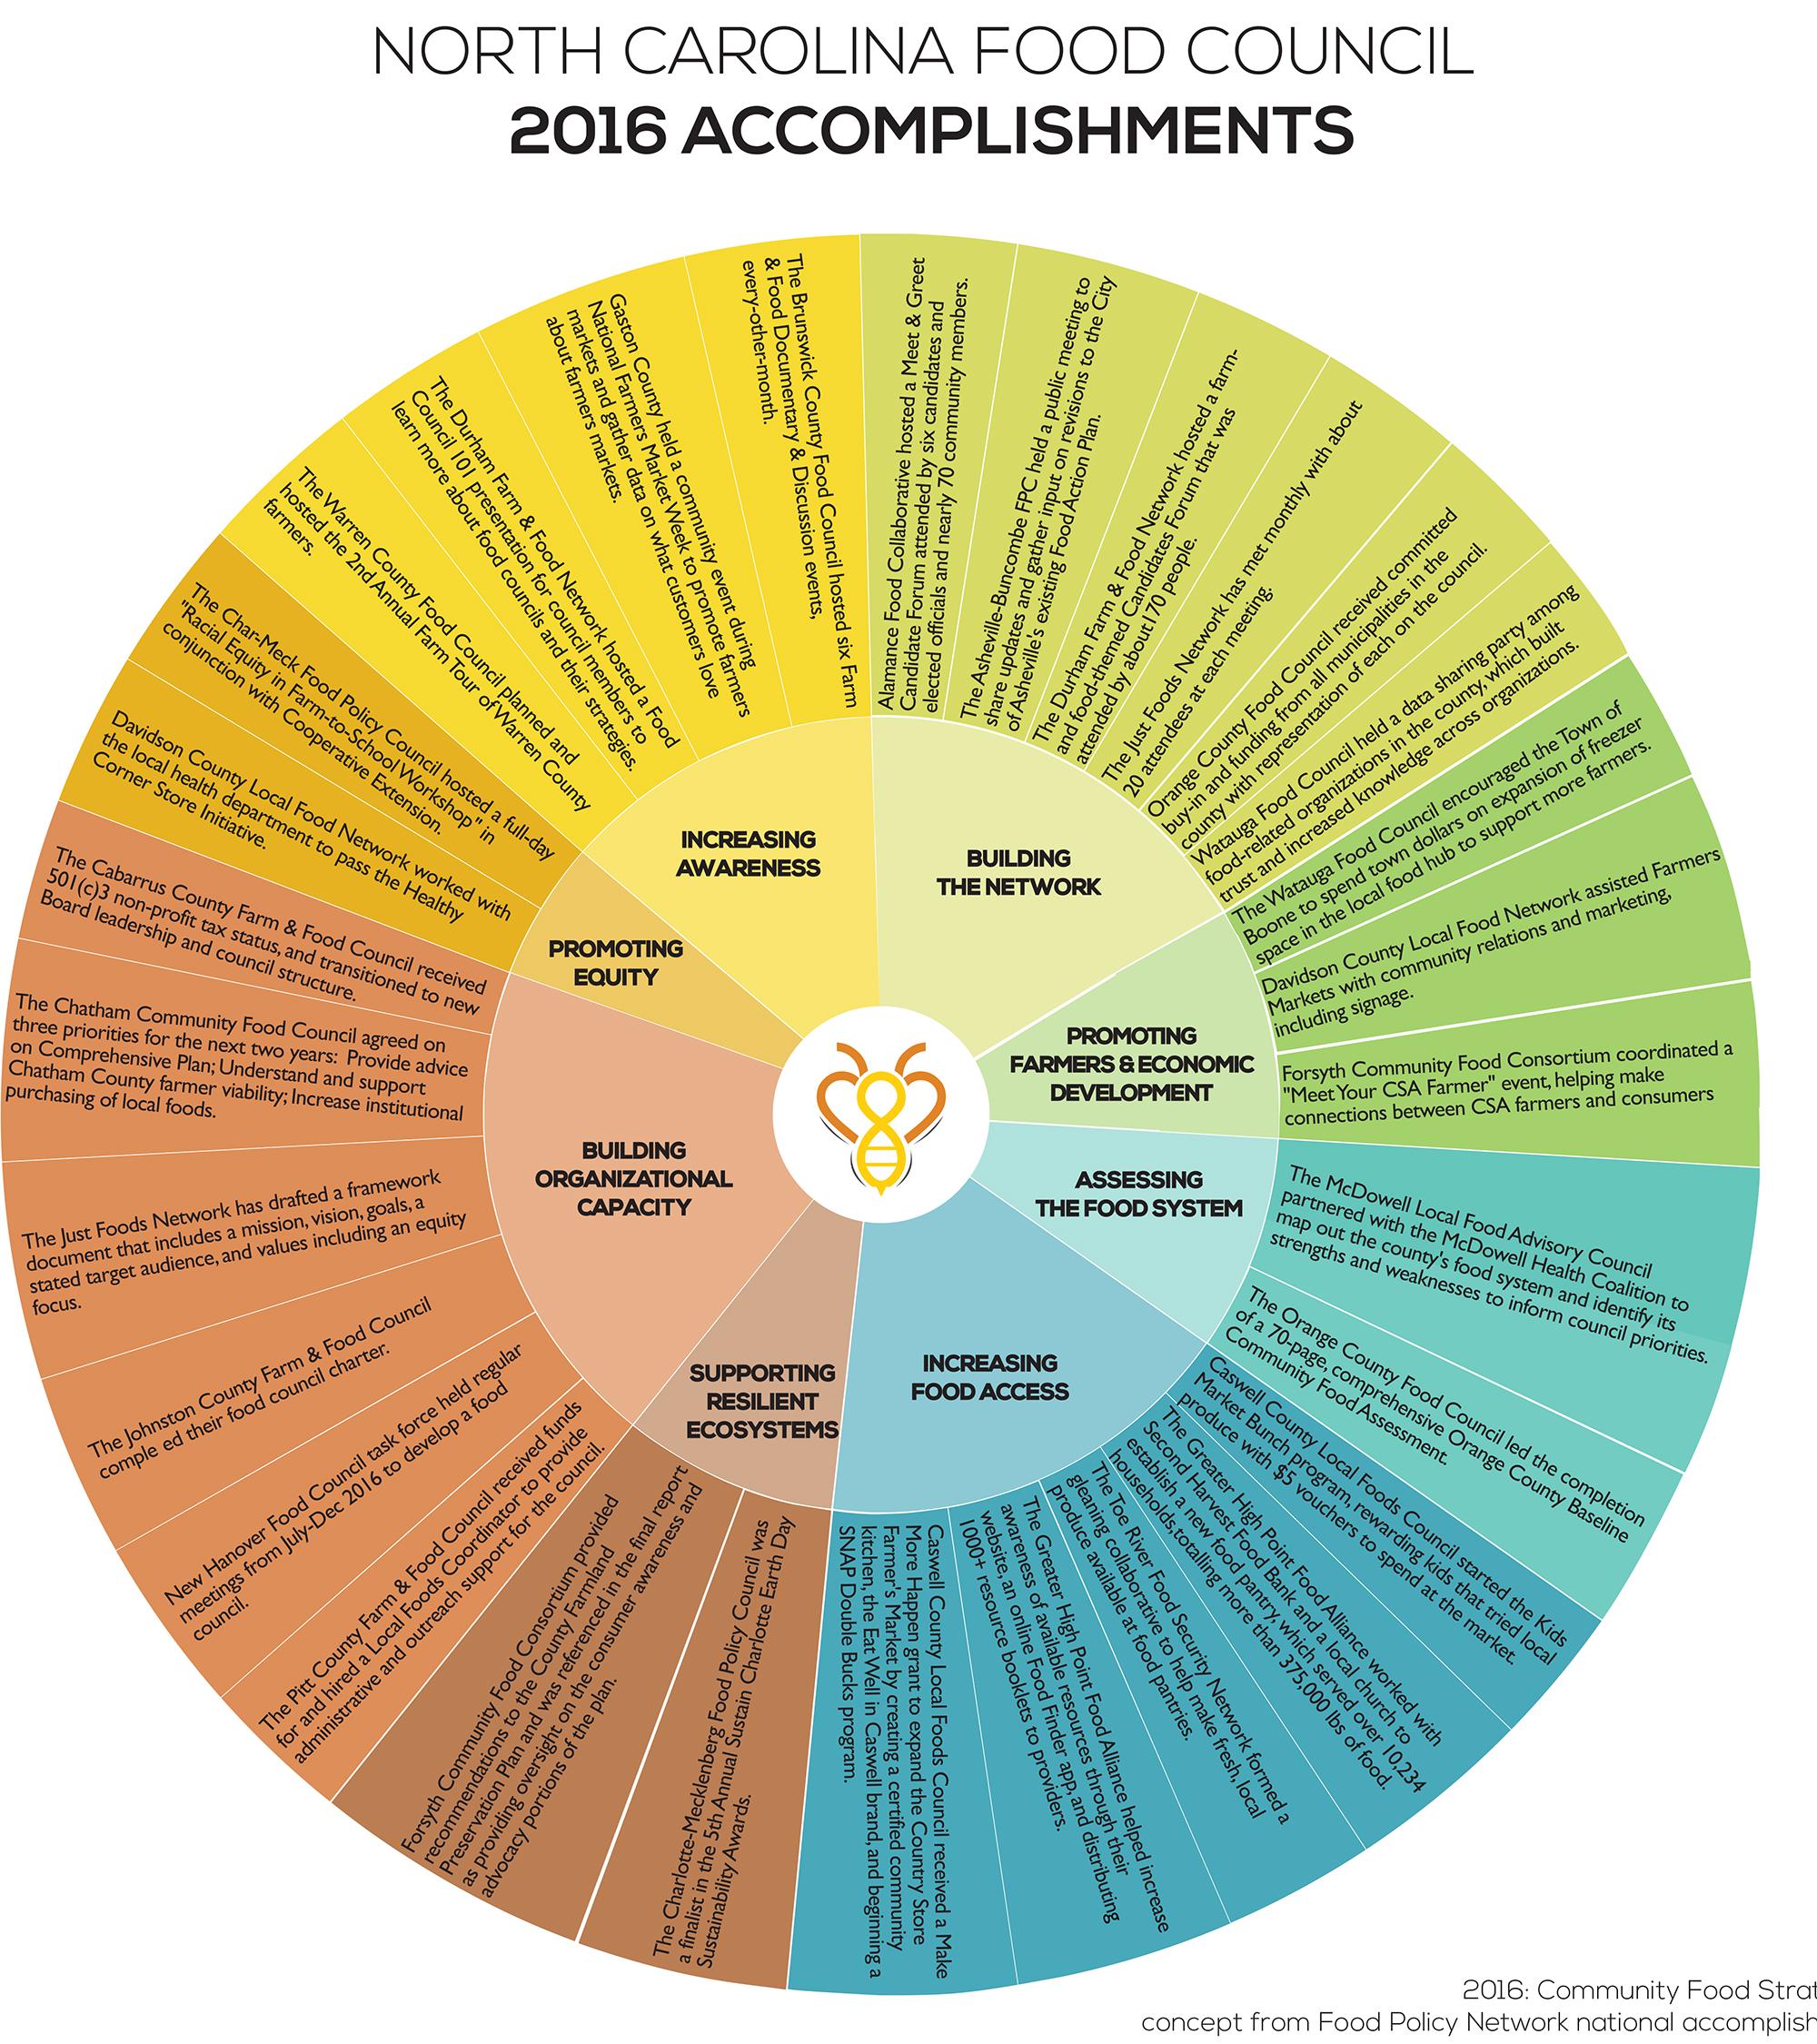 NCFoodCouncilAccomplishments_2016_Final_v2